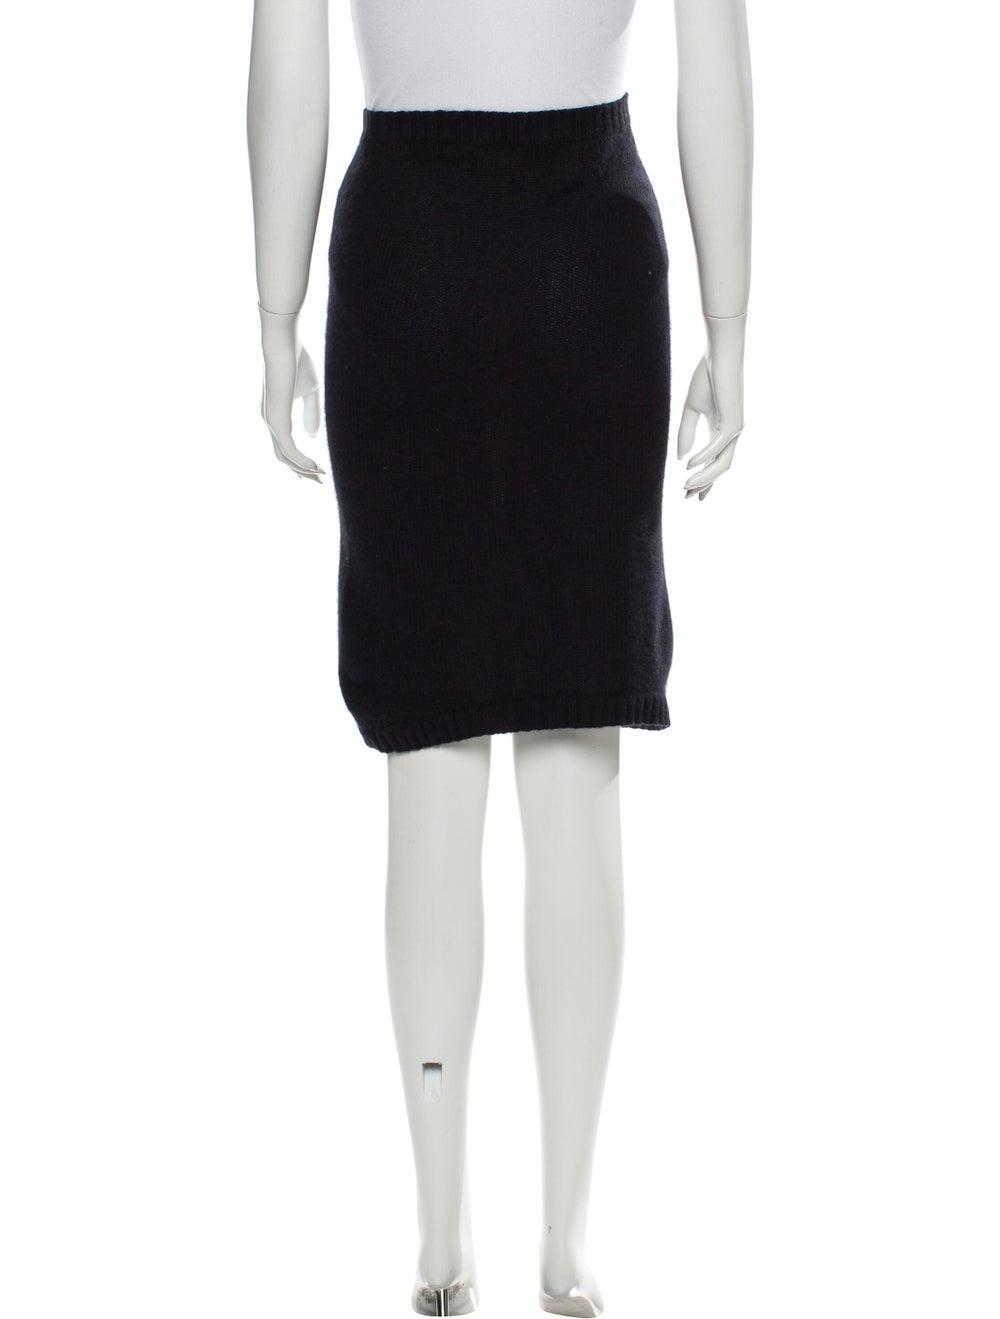 Acne Studios Angora Knee-Length Skirt Black - image 3